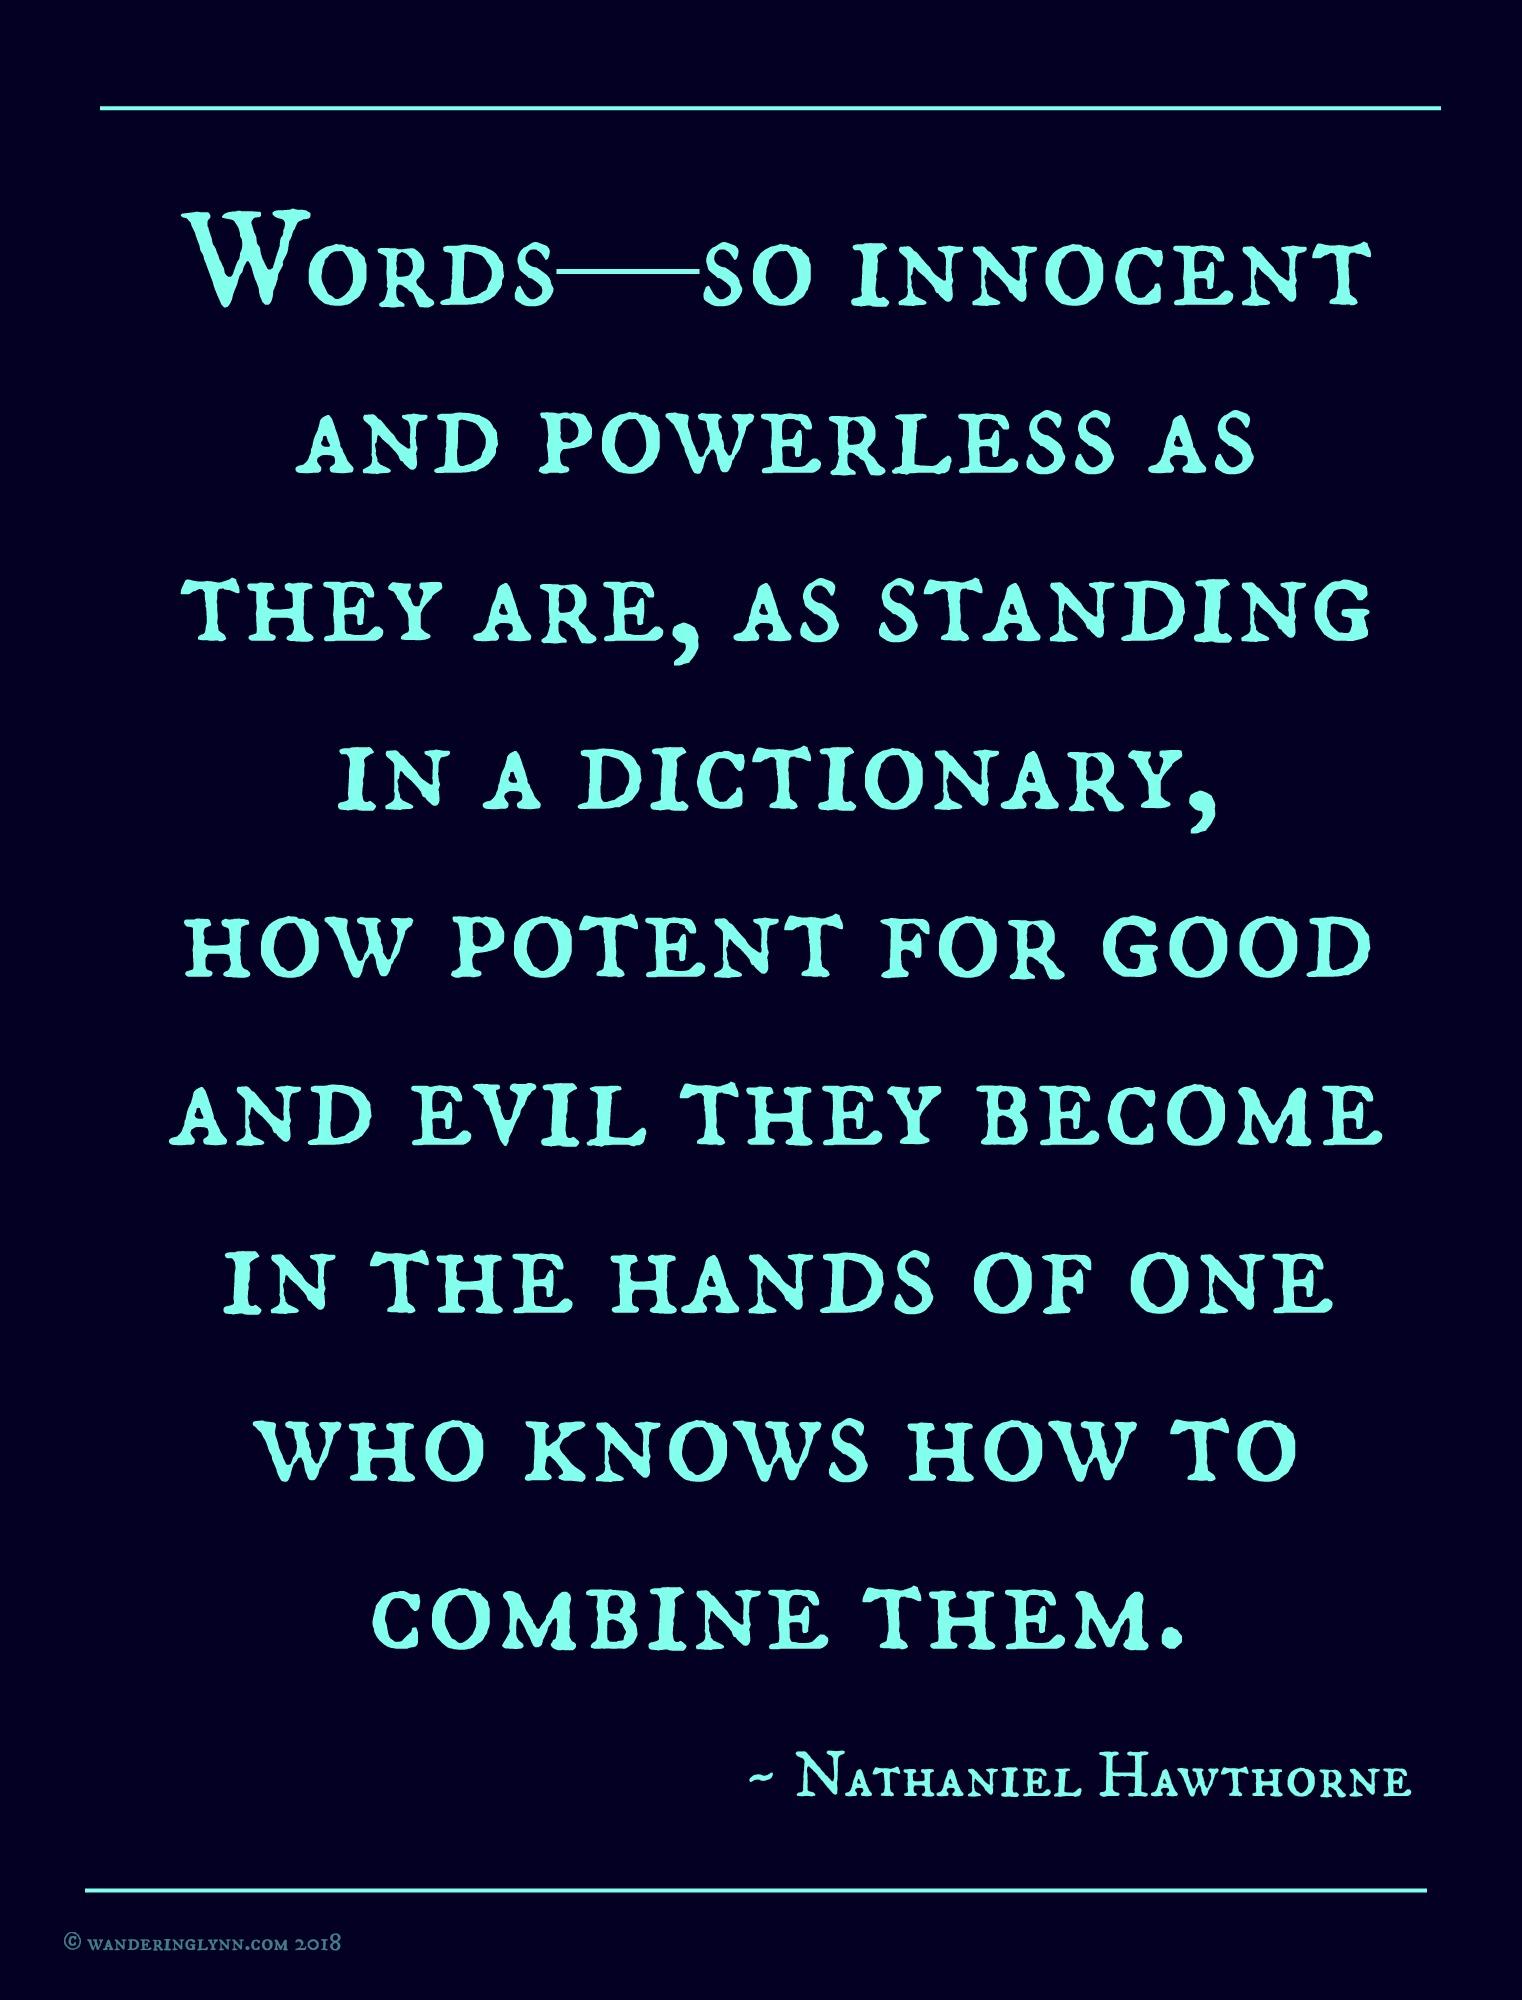 words_Hawthorne.jpg